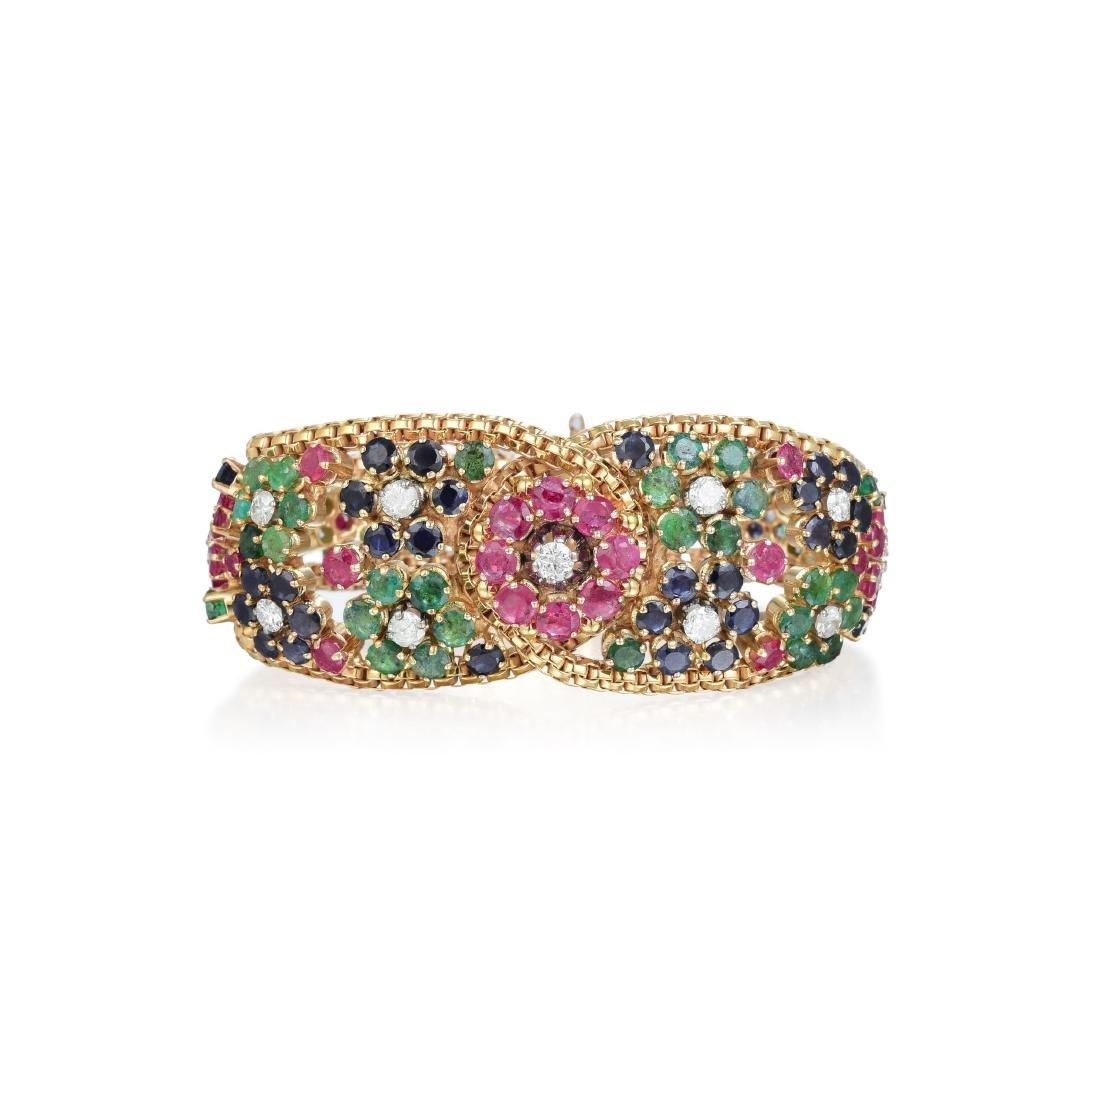 A 14K Gold Diamond, Ruby, Emerald and Sapphire Bracelet